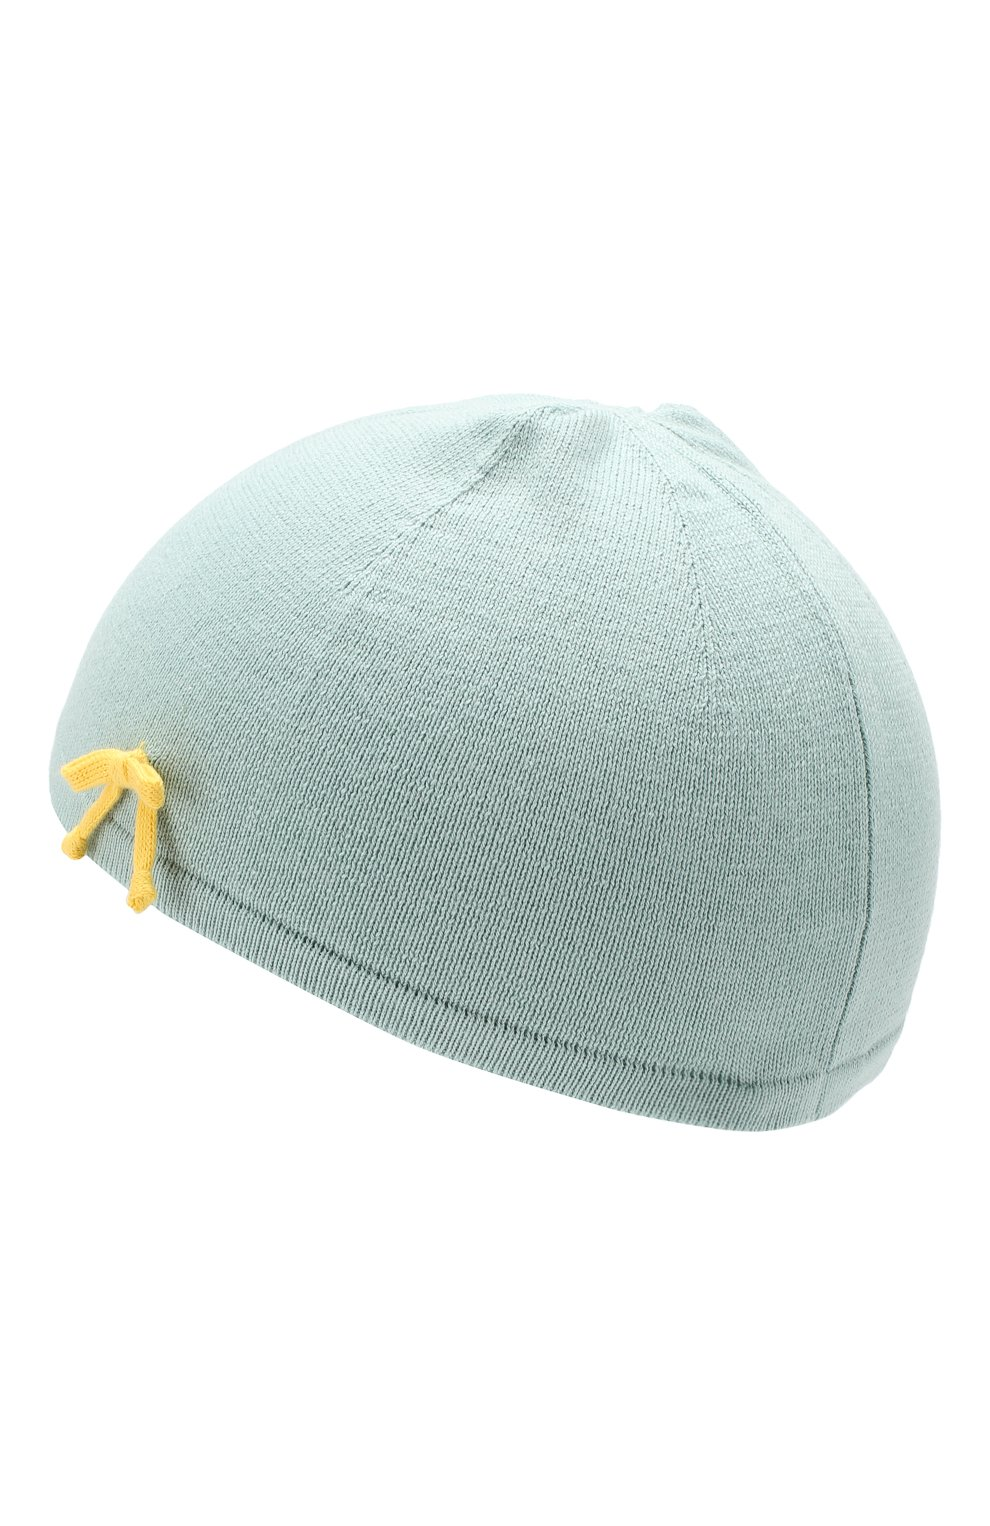 Хлопковая шапка Baby T зеленого цвета   Фото №2